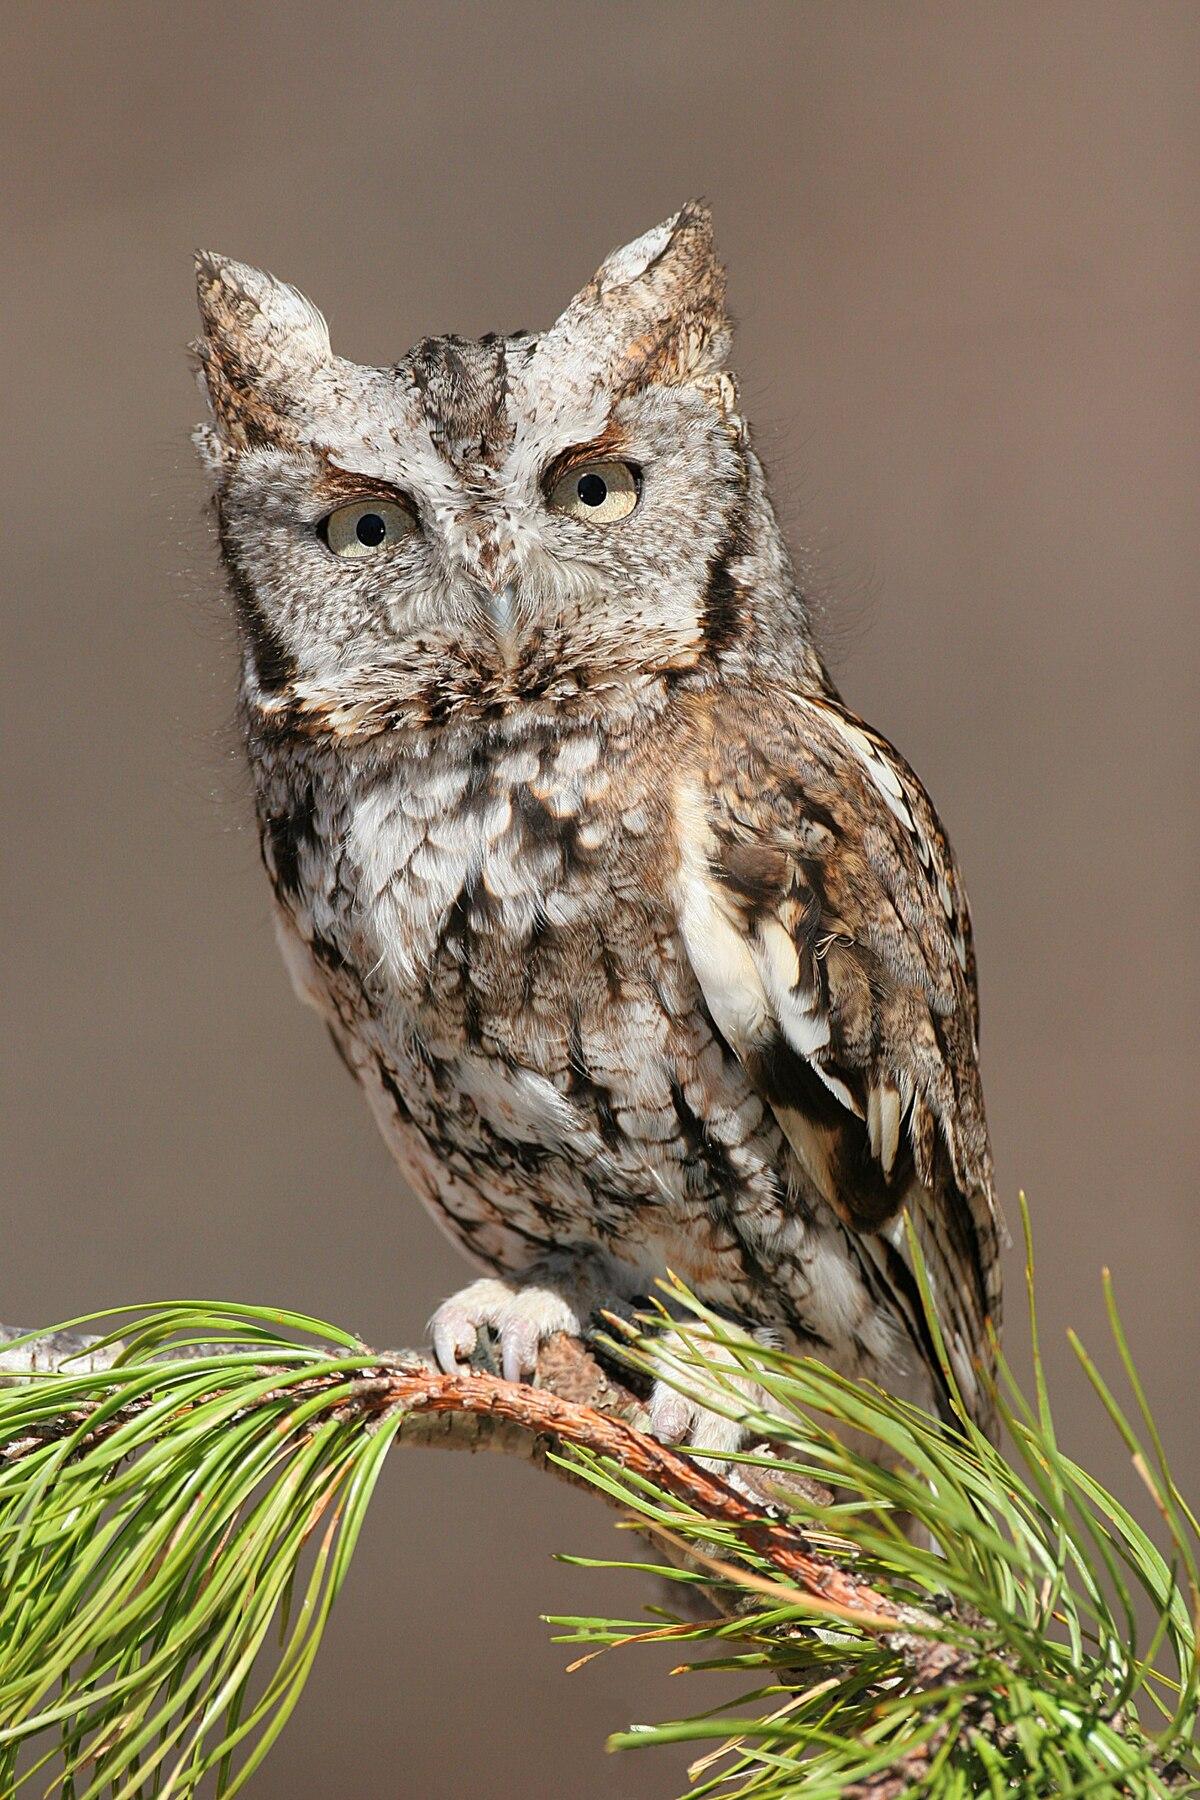 Can A Screech Owl Pick Up A Cat